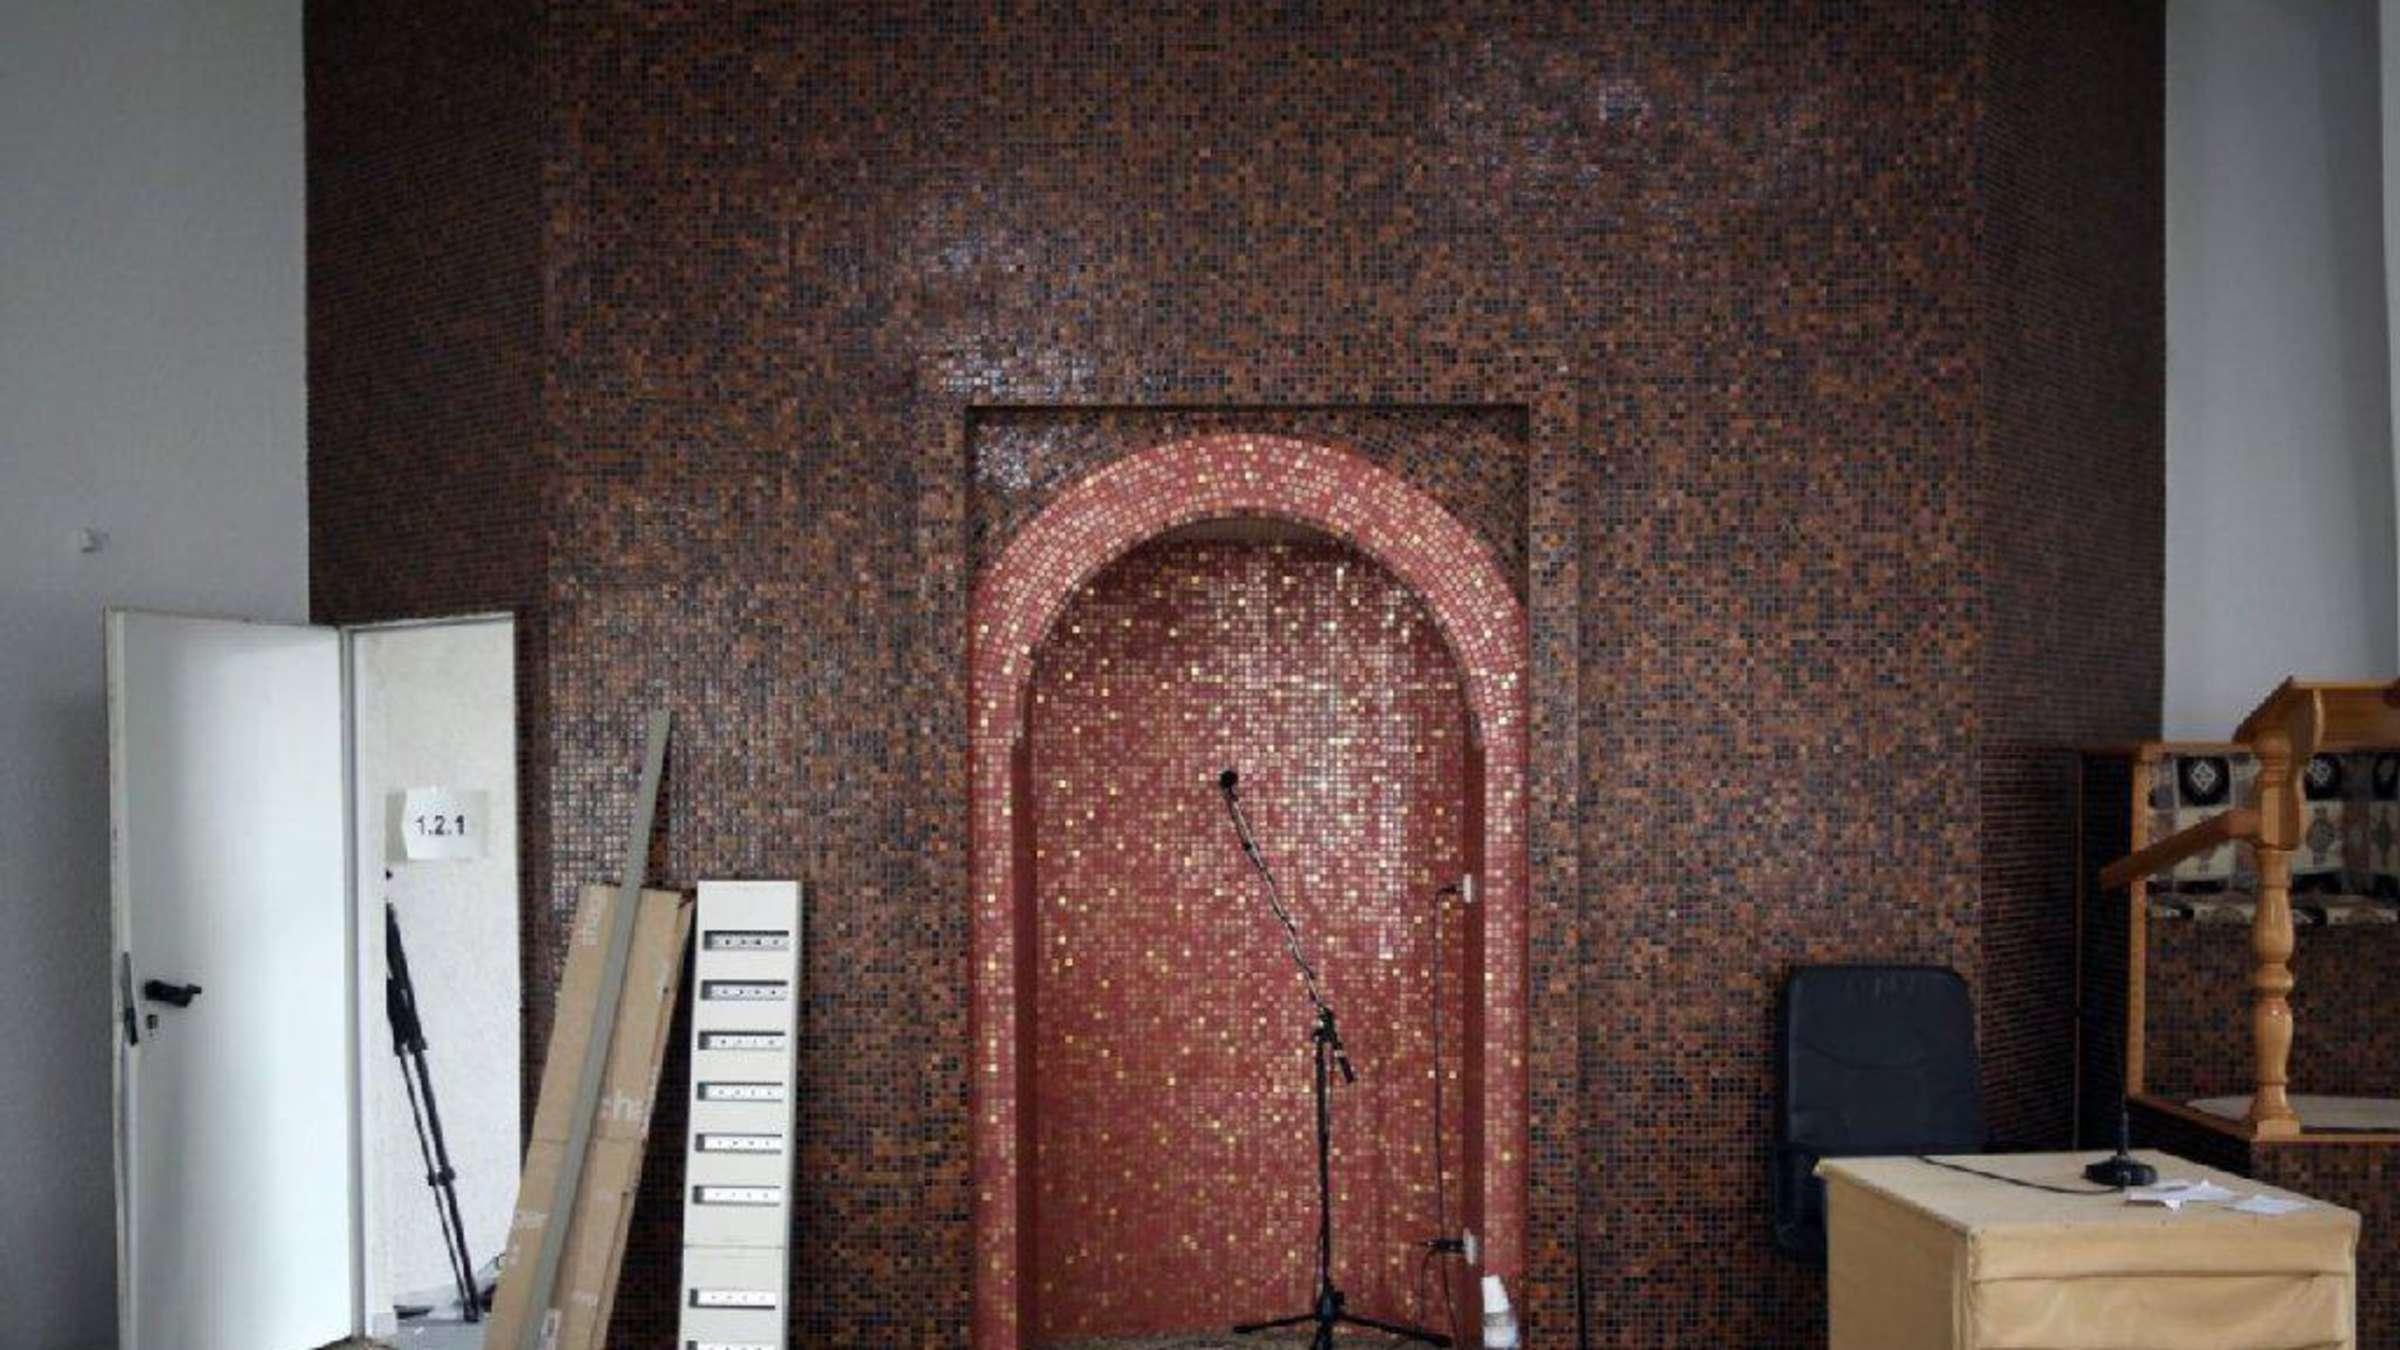 bilal moschee berlin